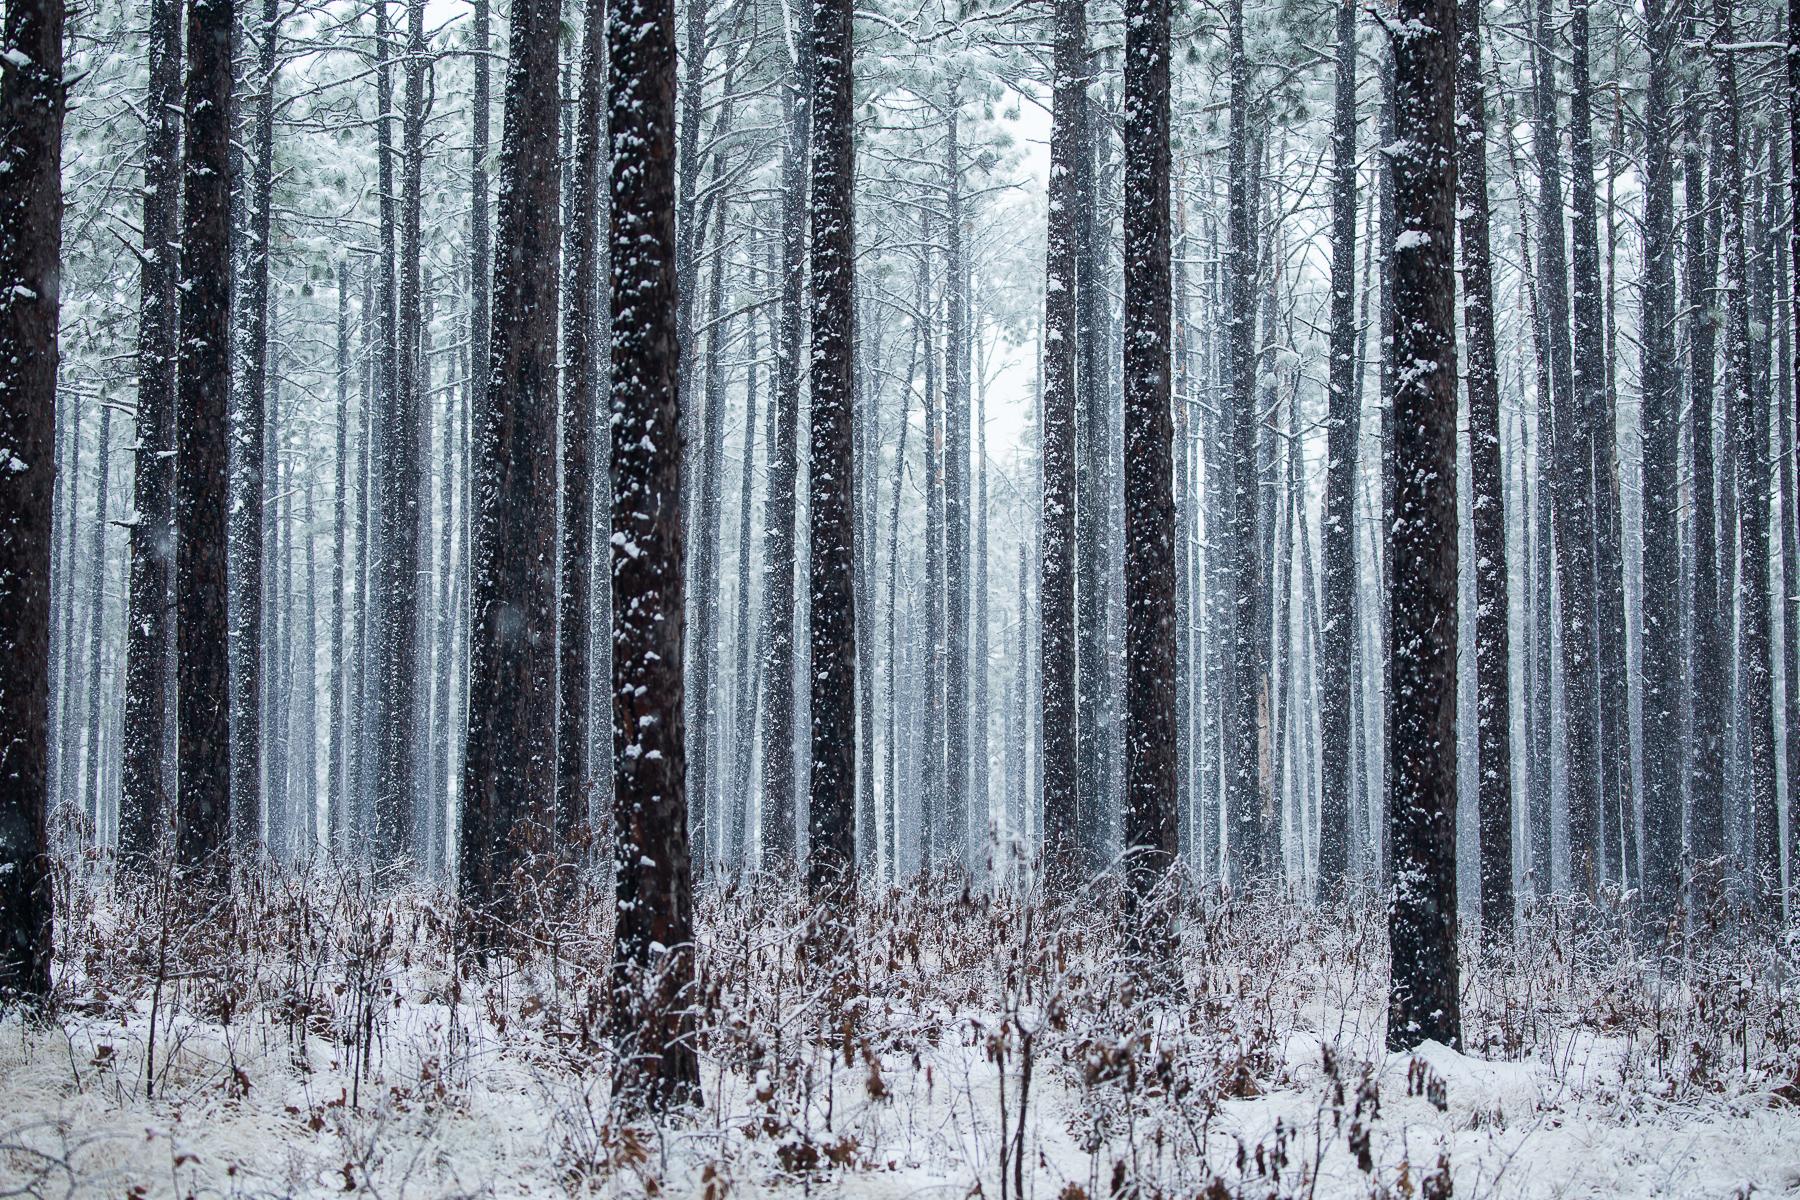 Gioia_Kuss_Long Leaf Pines (Take my Breath Away)_-Long-leaf Pines in the Snow6.jpg